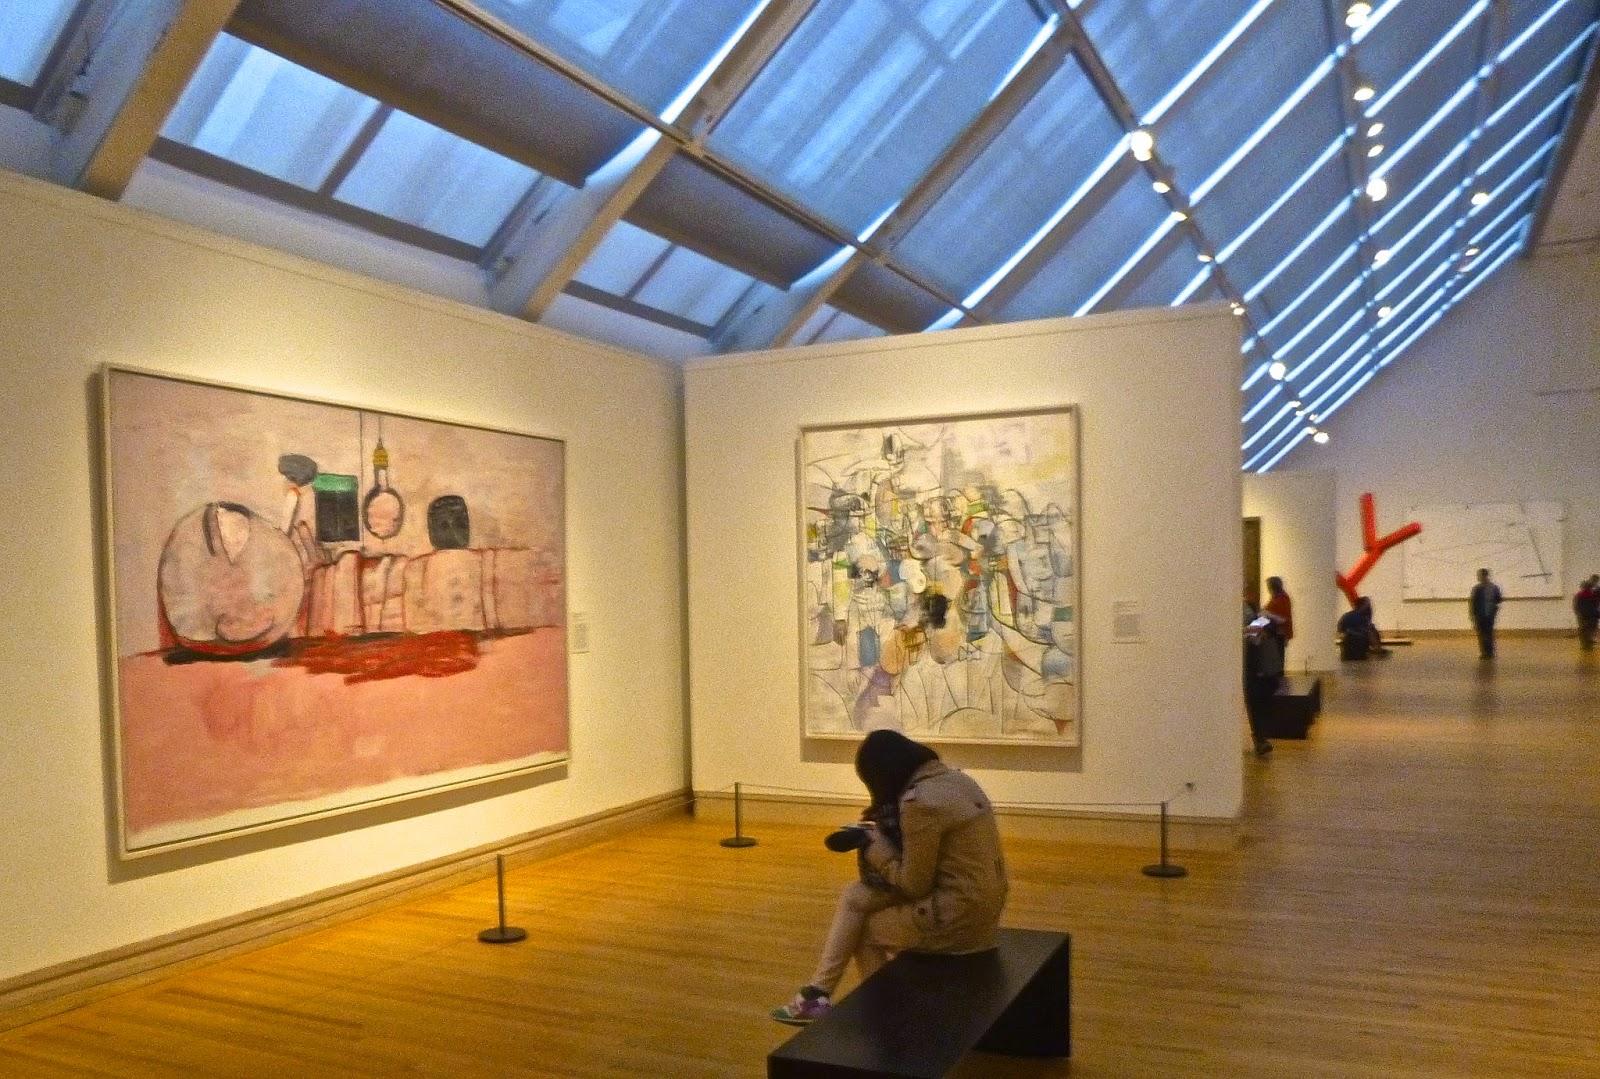 modern art essay visual essay expression in the weimar republic  drivebycuriosity culture the met museum becomes modern a drivebycuriosity if you like modern contemporary art new